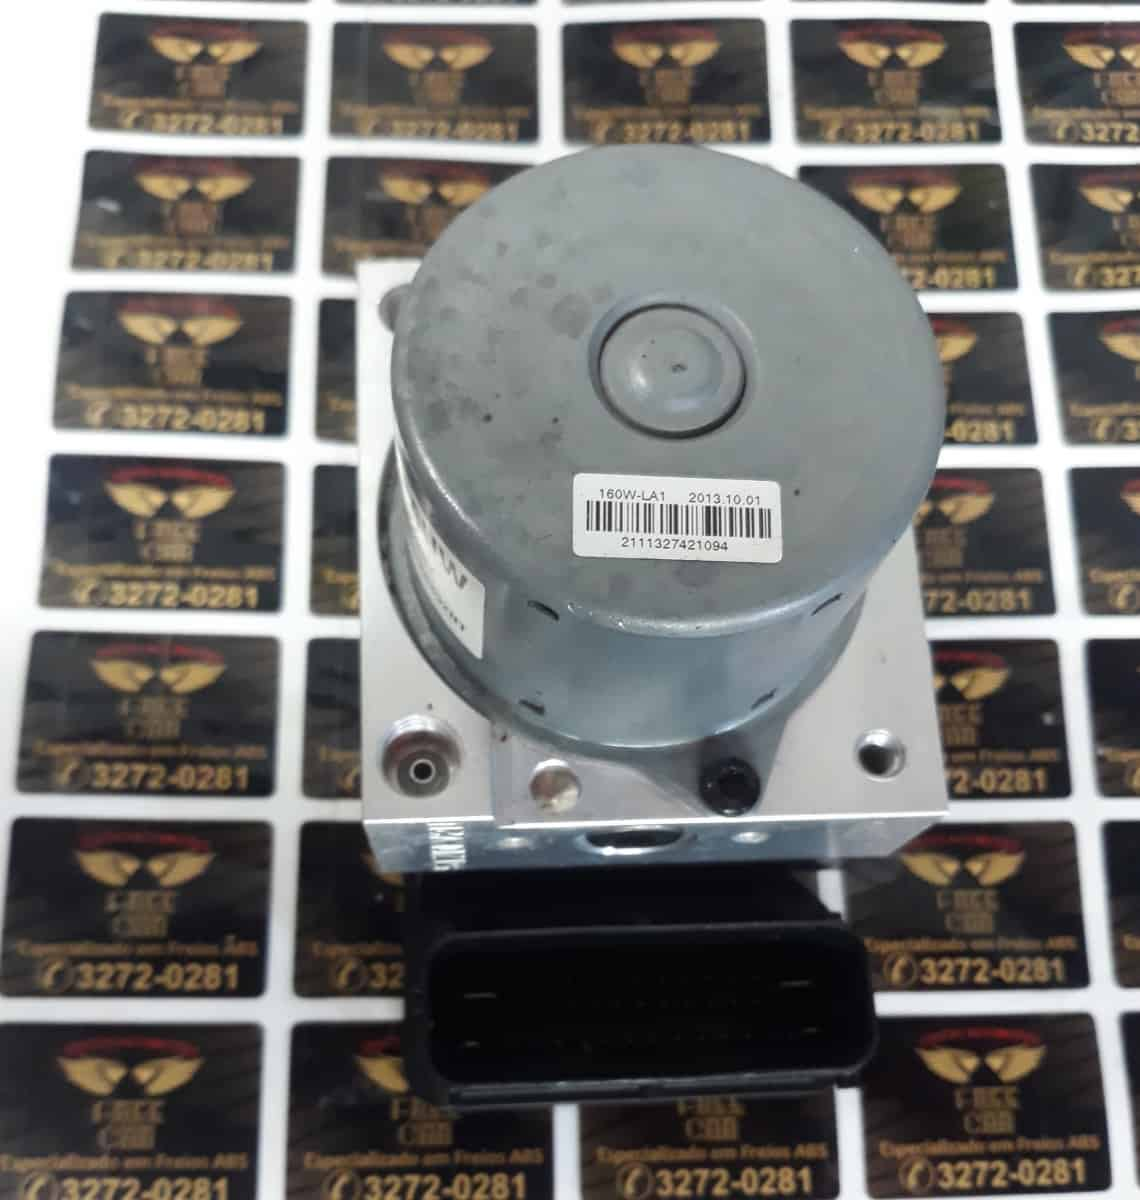 Modulo ABS Chevrolet 52058502 - Foto 2